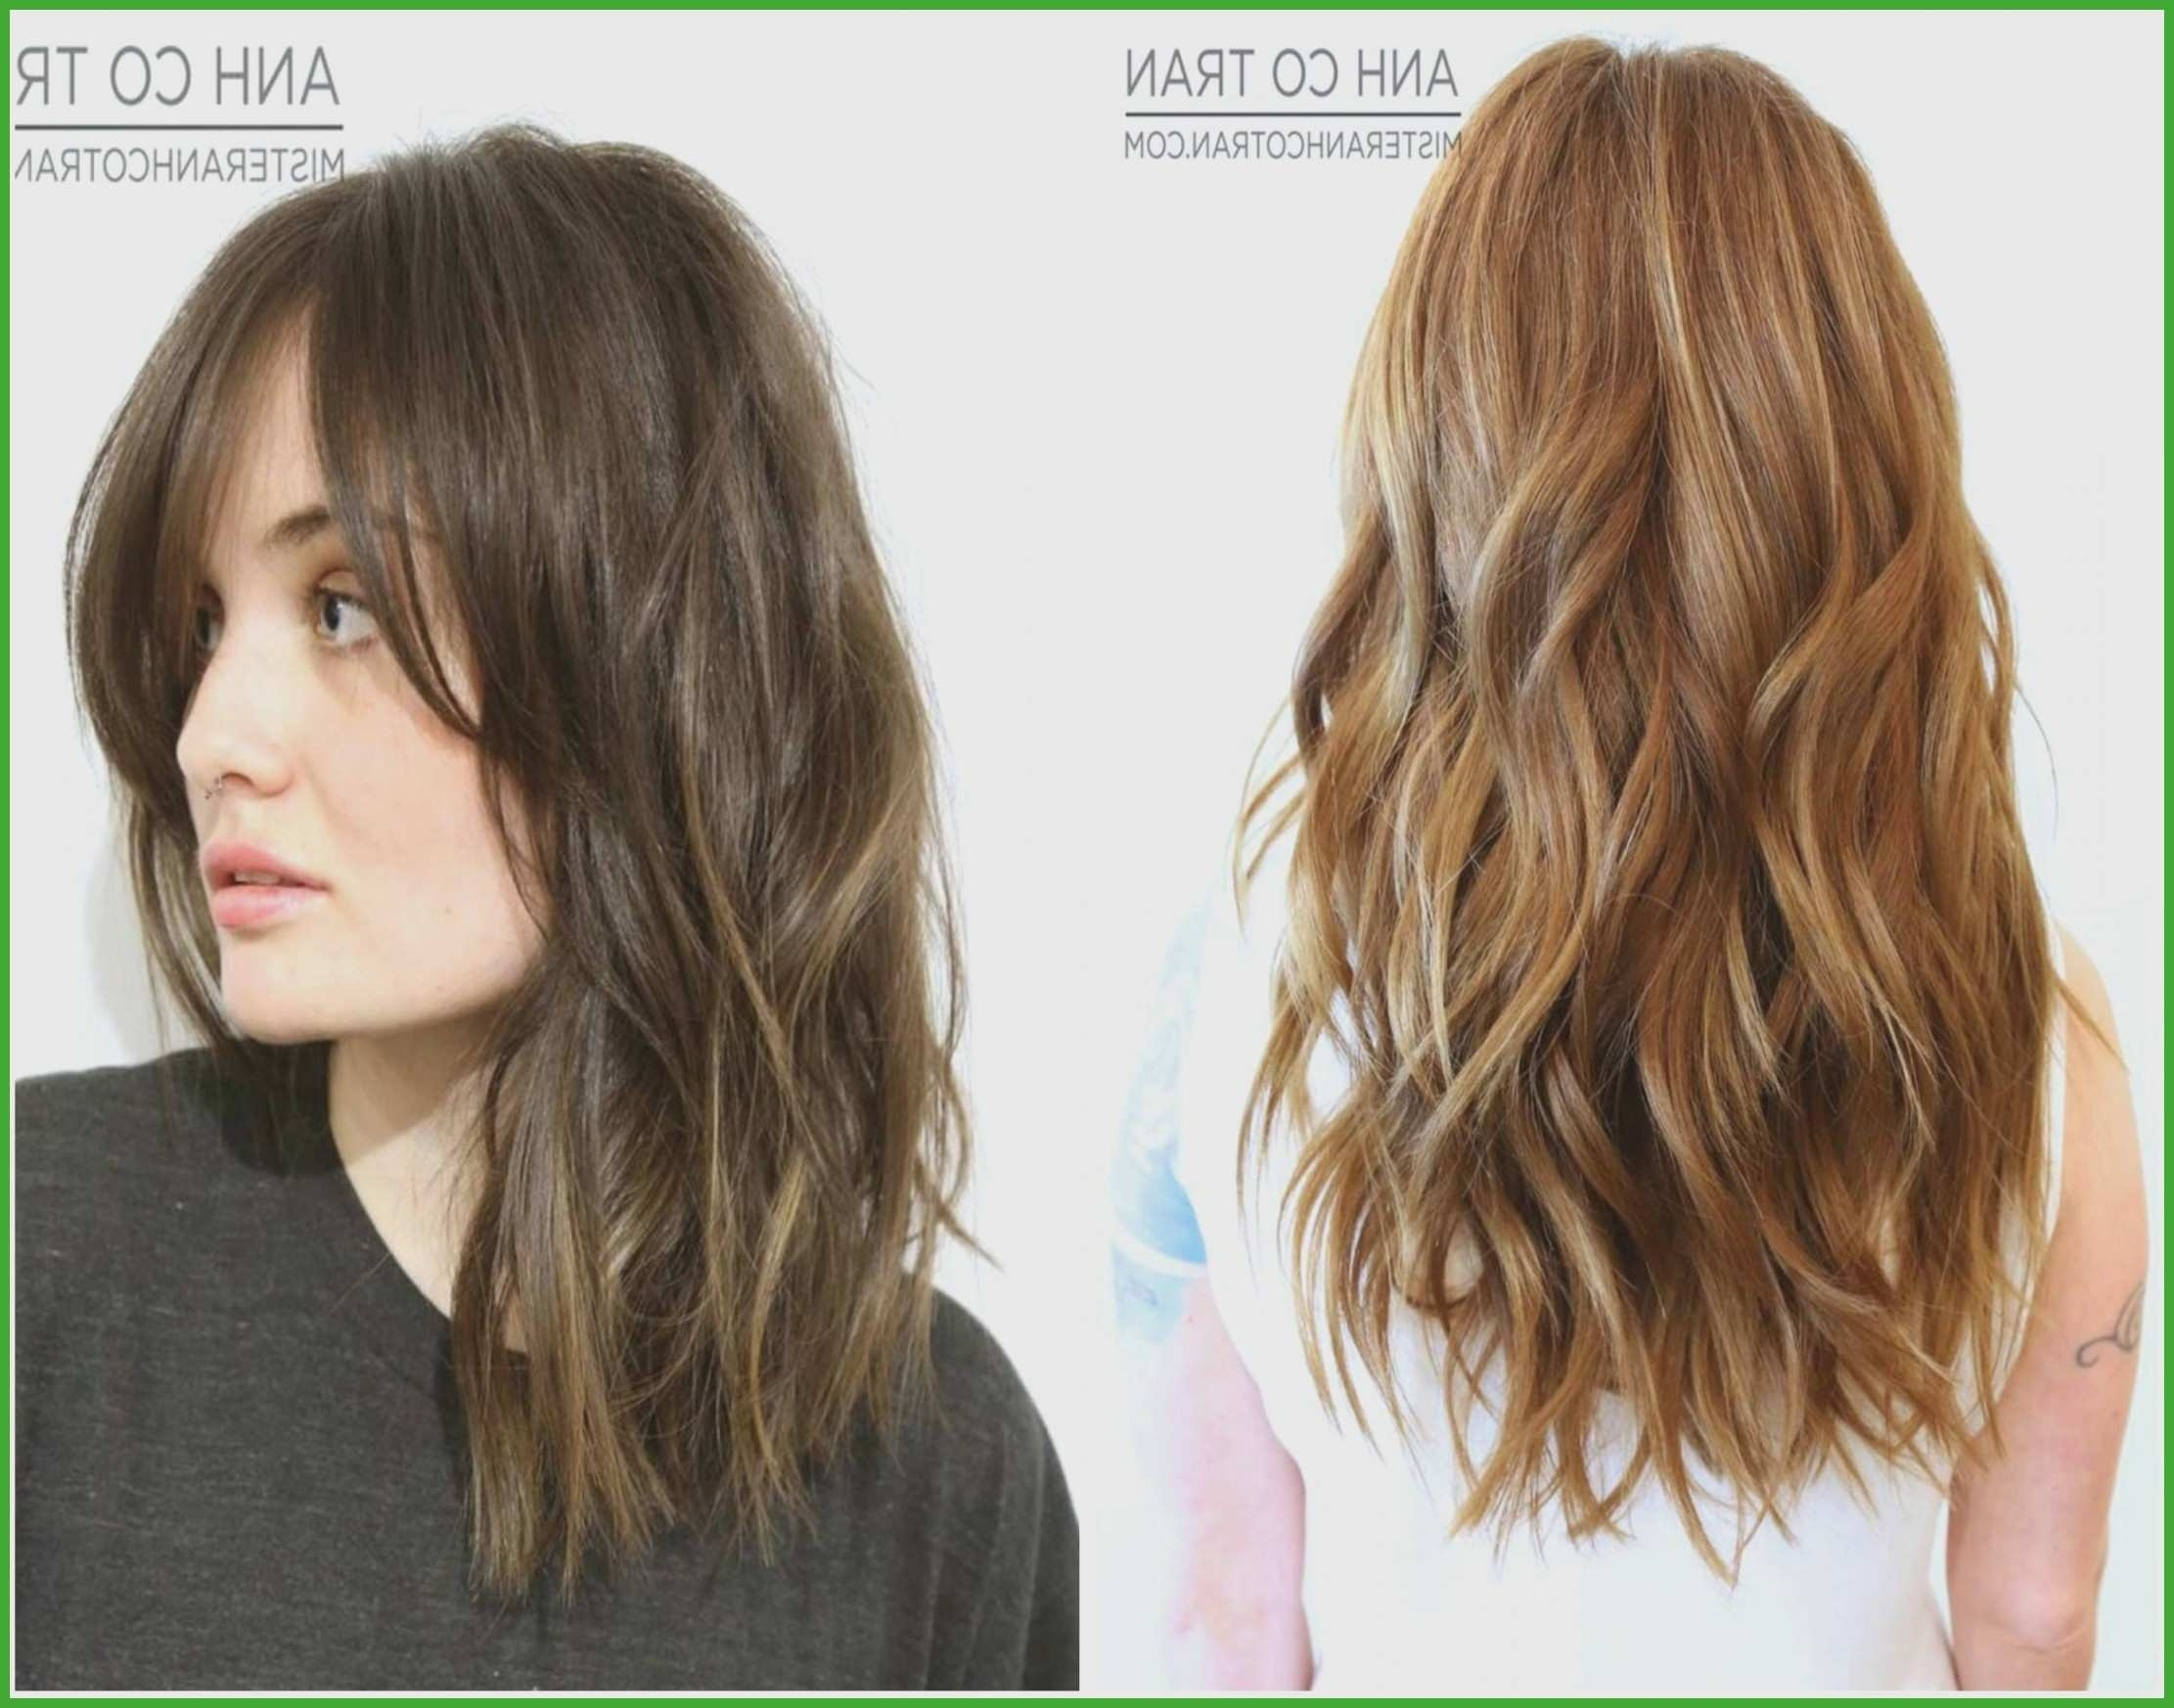 Fashion : Medium Brown Hair With Blonde Highlights The New within Asian Hair With Blonde Highlights